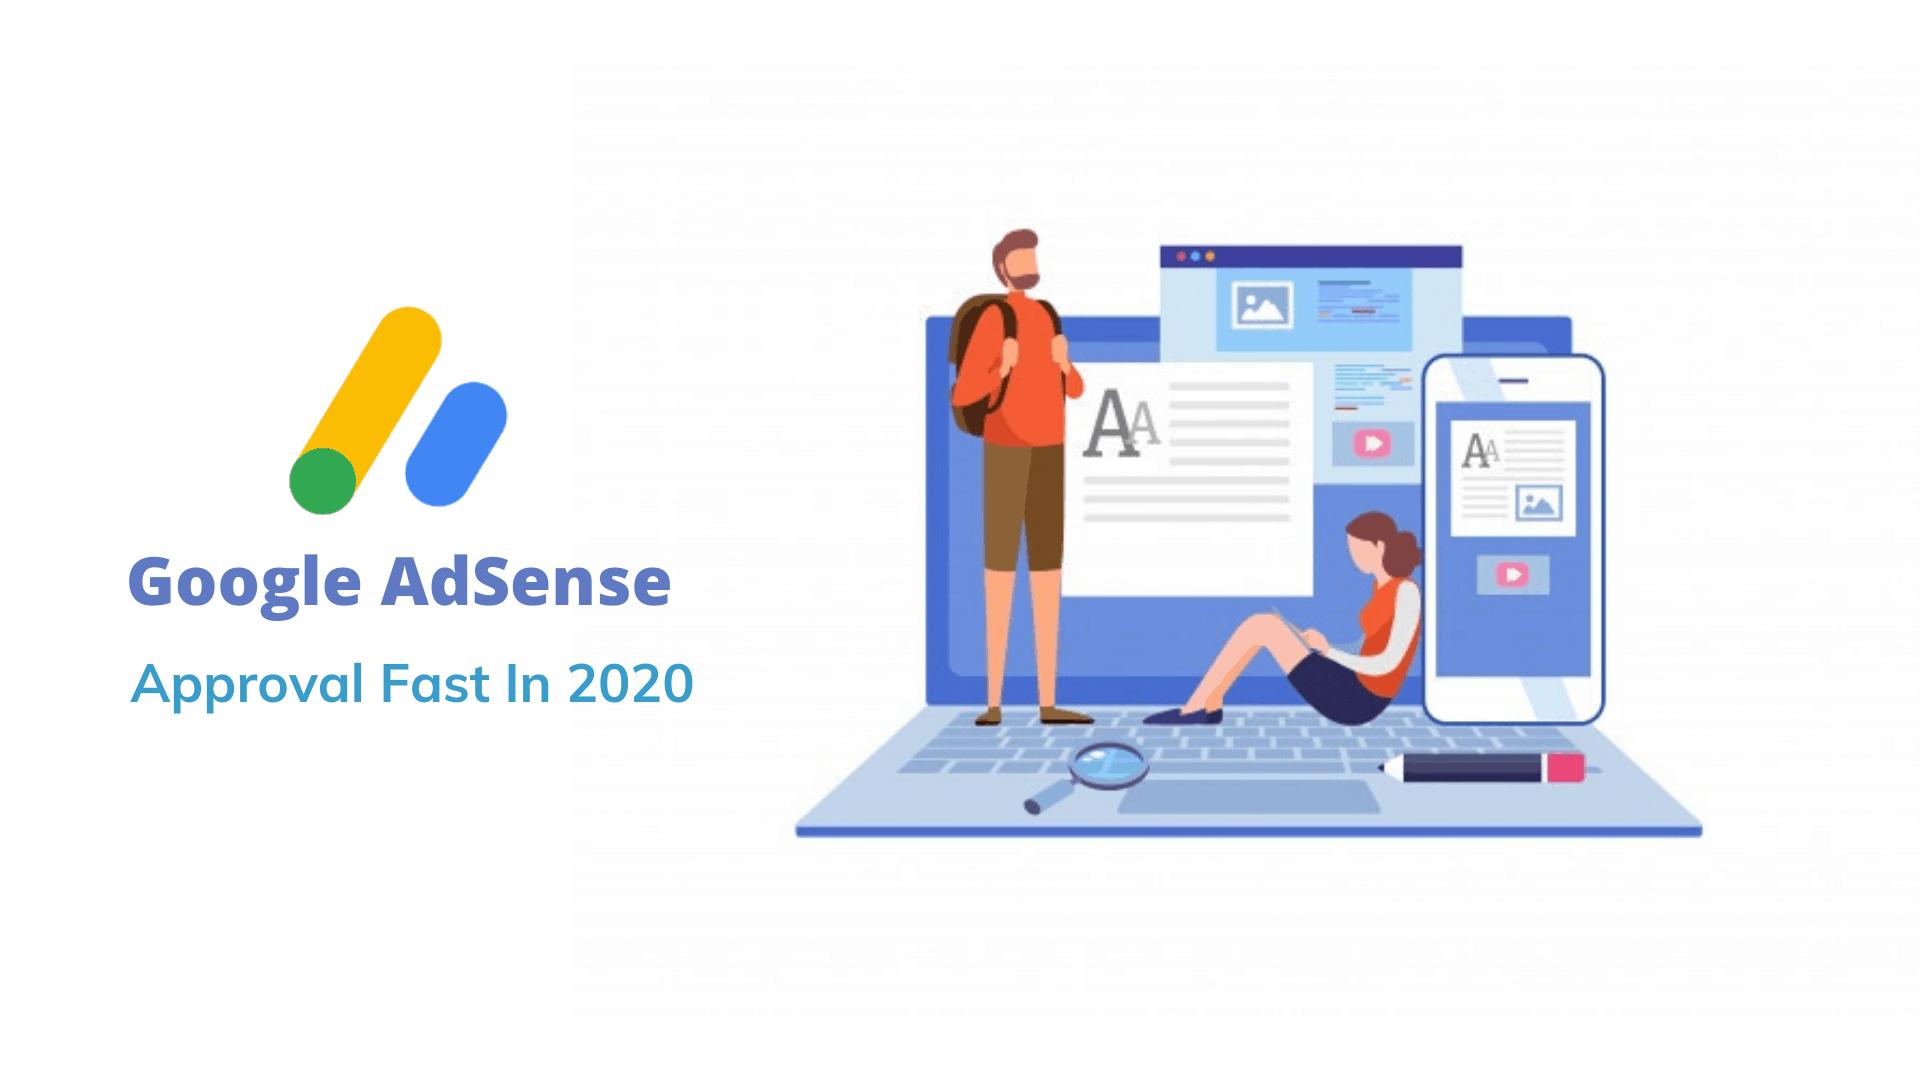 google_adsense_approval_fast_2020